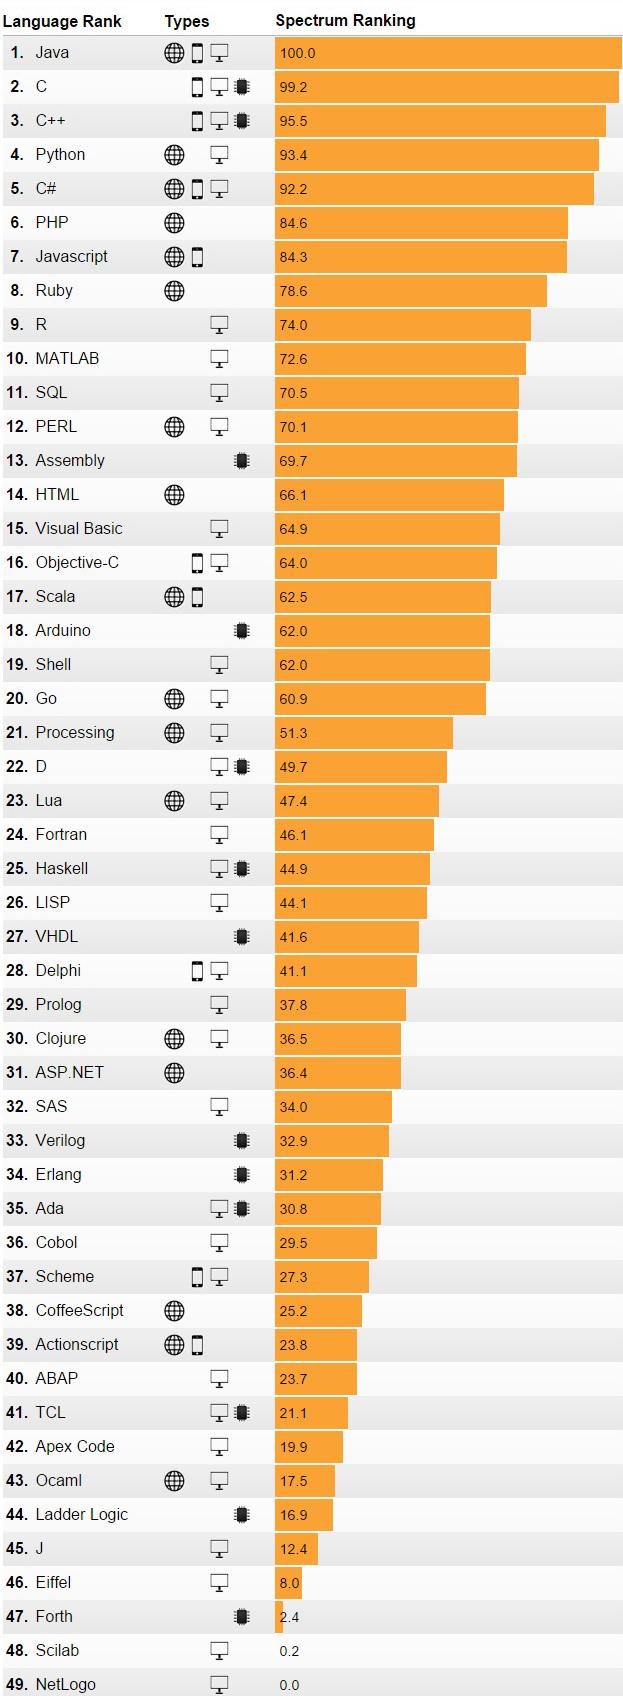 java-the-most-favorite-programming-language